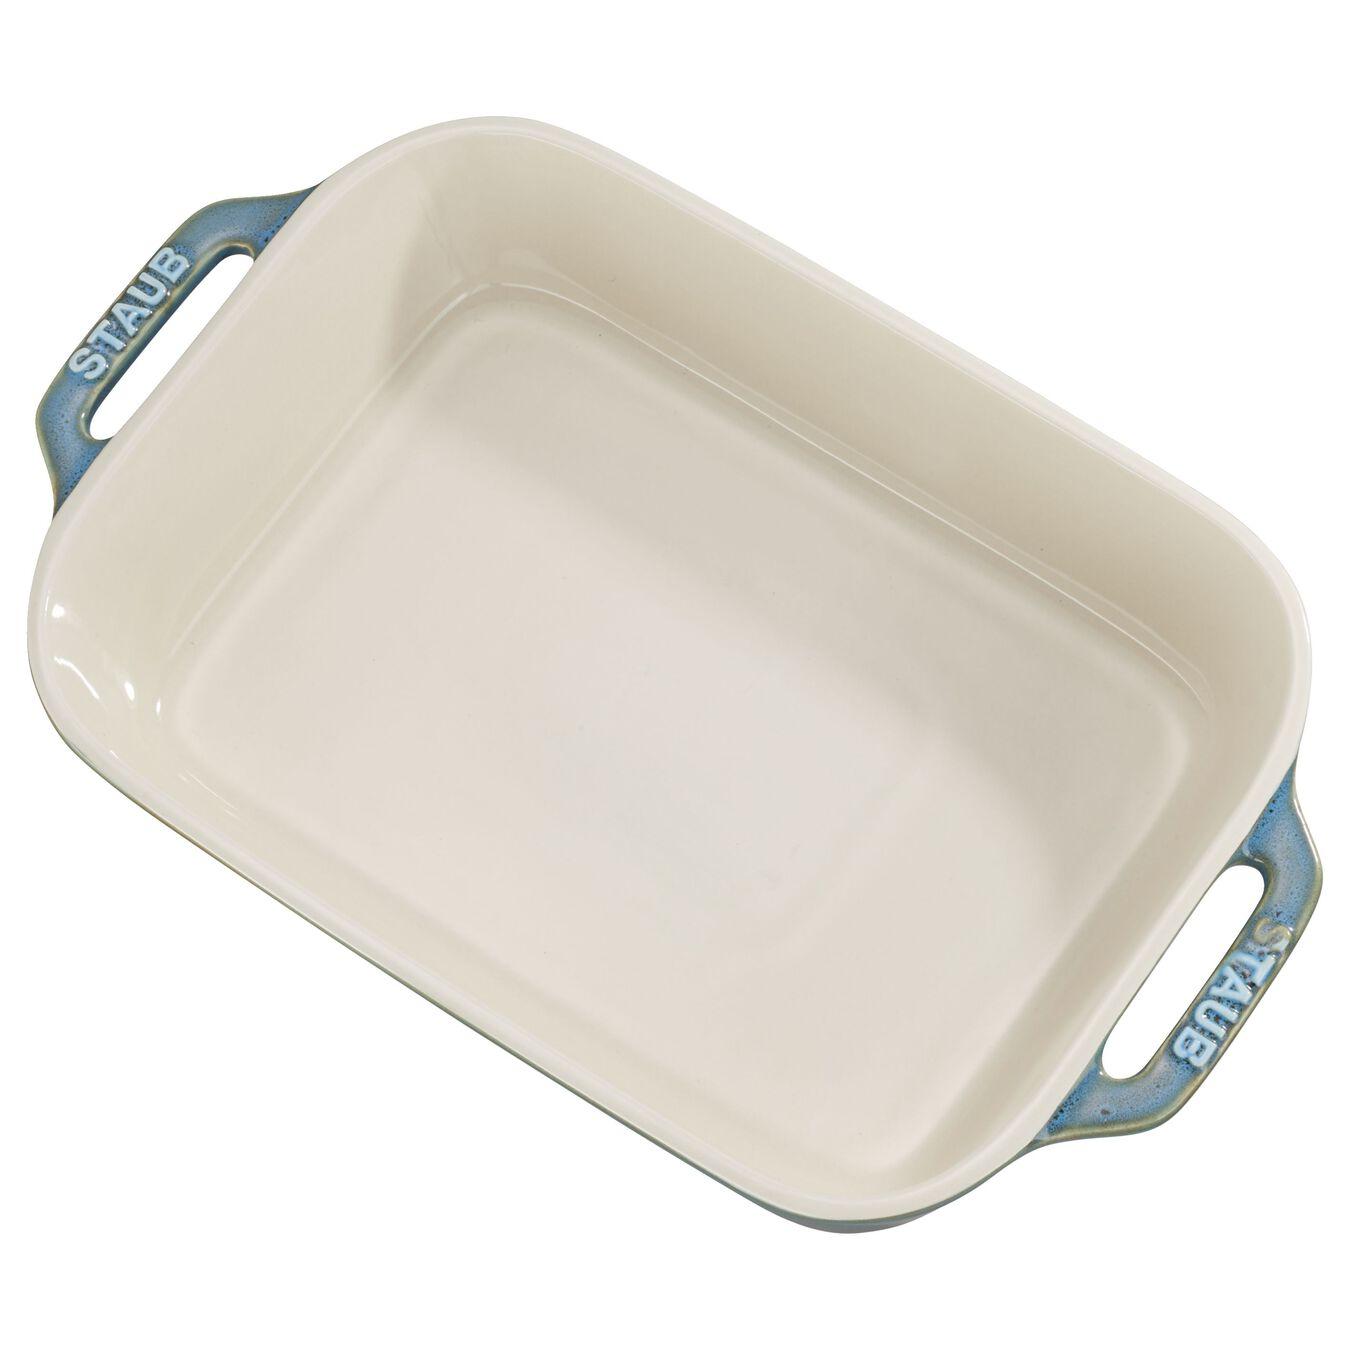 10.5-inch x 7.5-inch Rectangular Baking Dish - Rustic Turquoise,,large 1